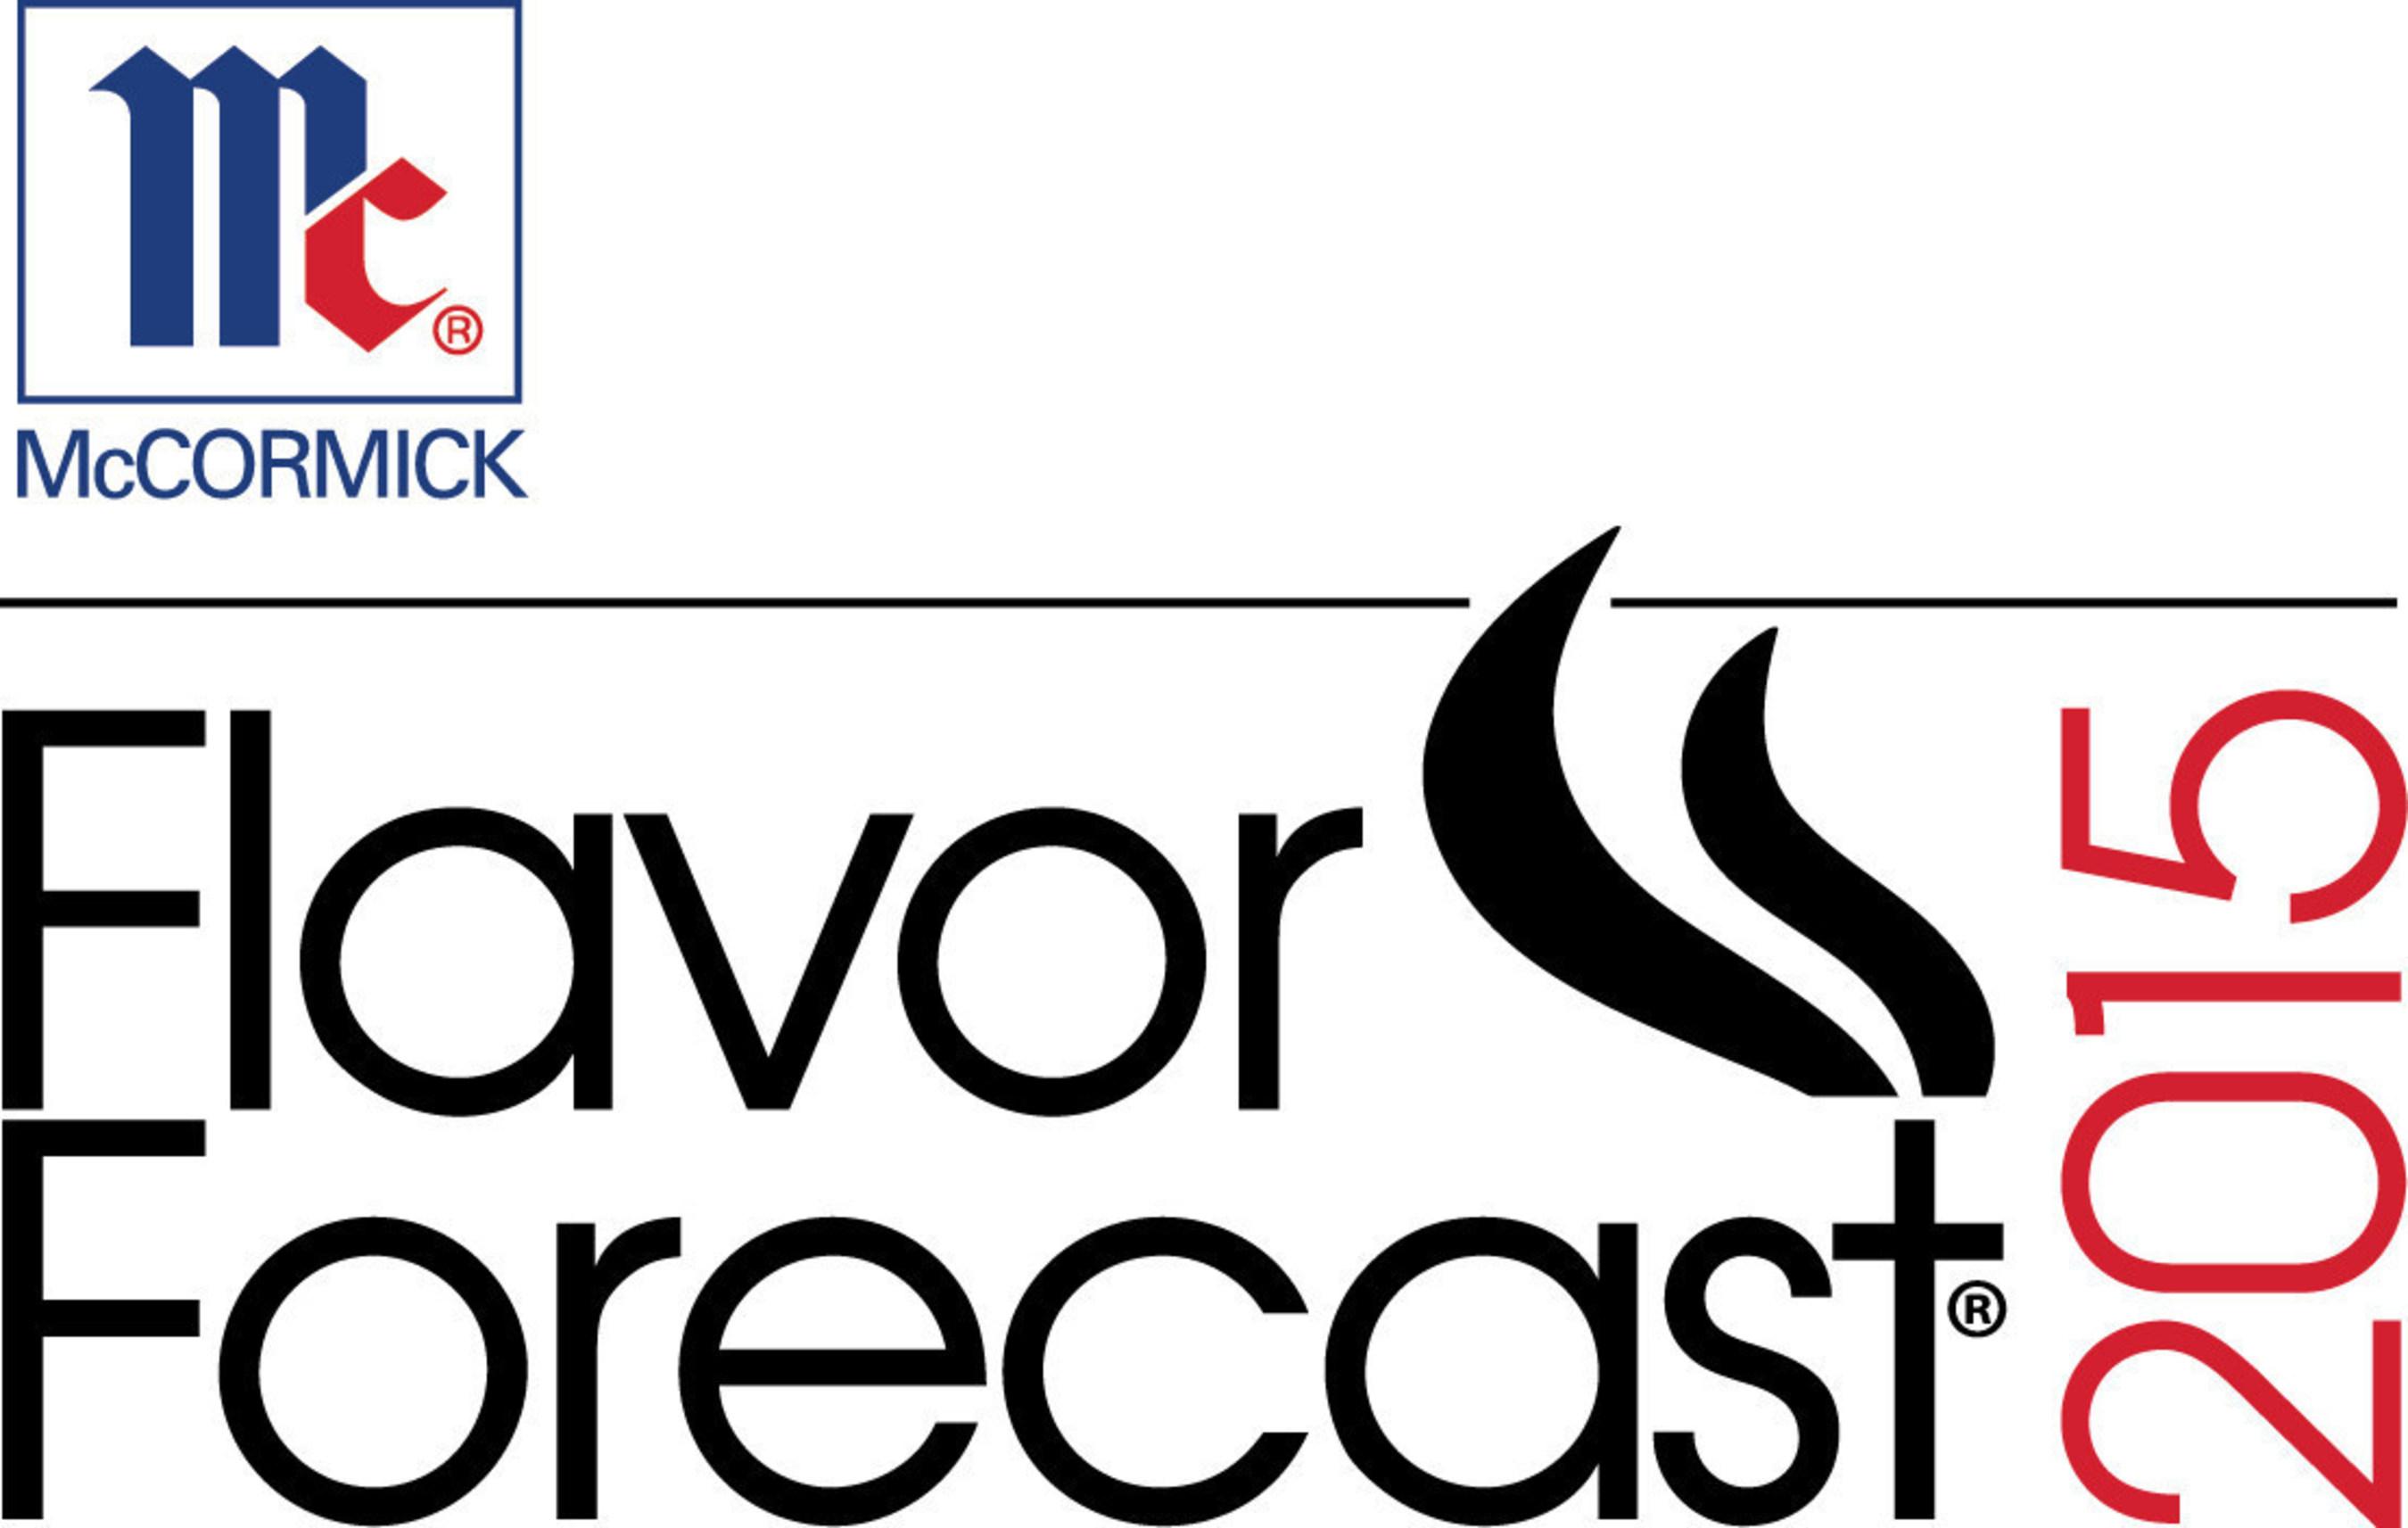 McCormick(R) Flavor Forecast(R) 2015